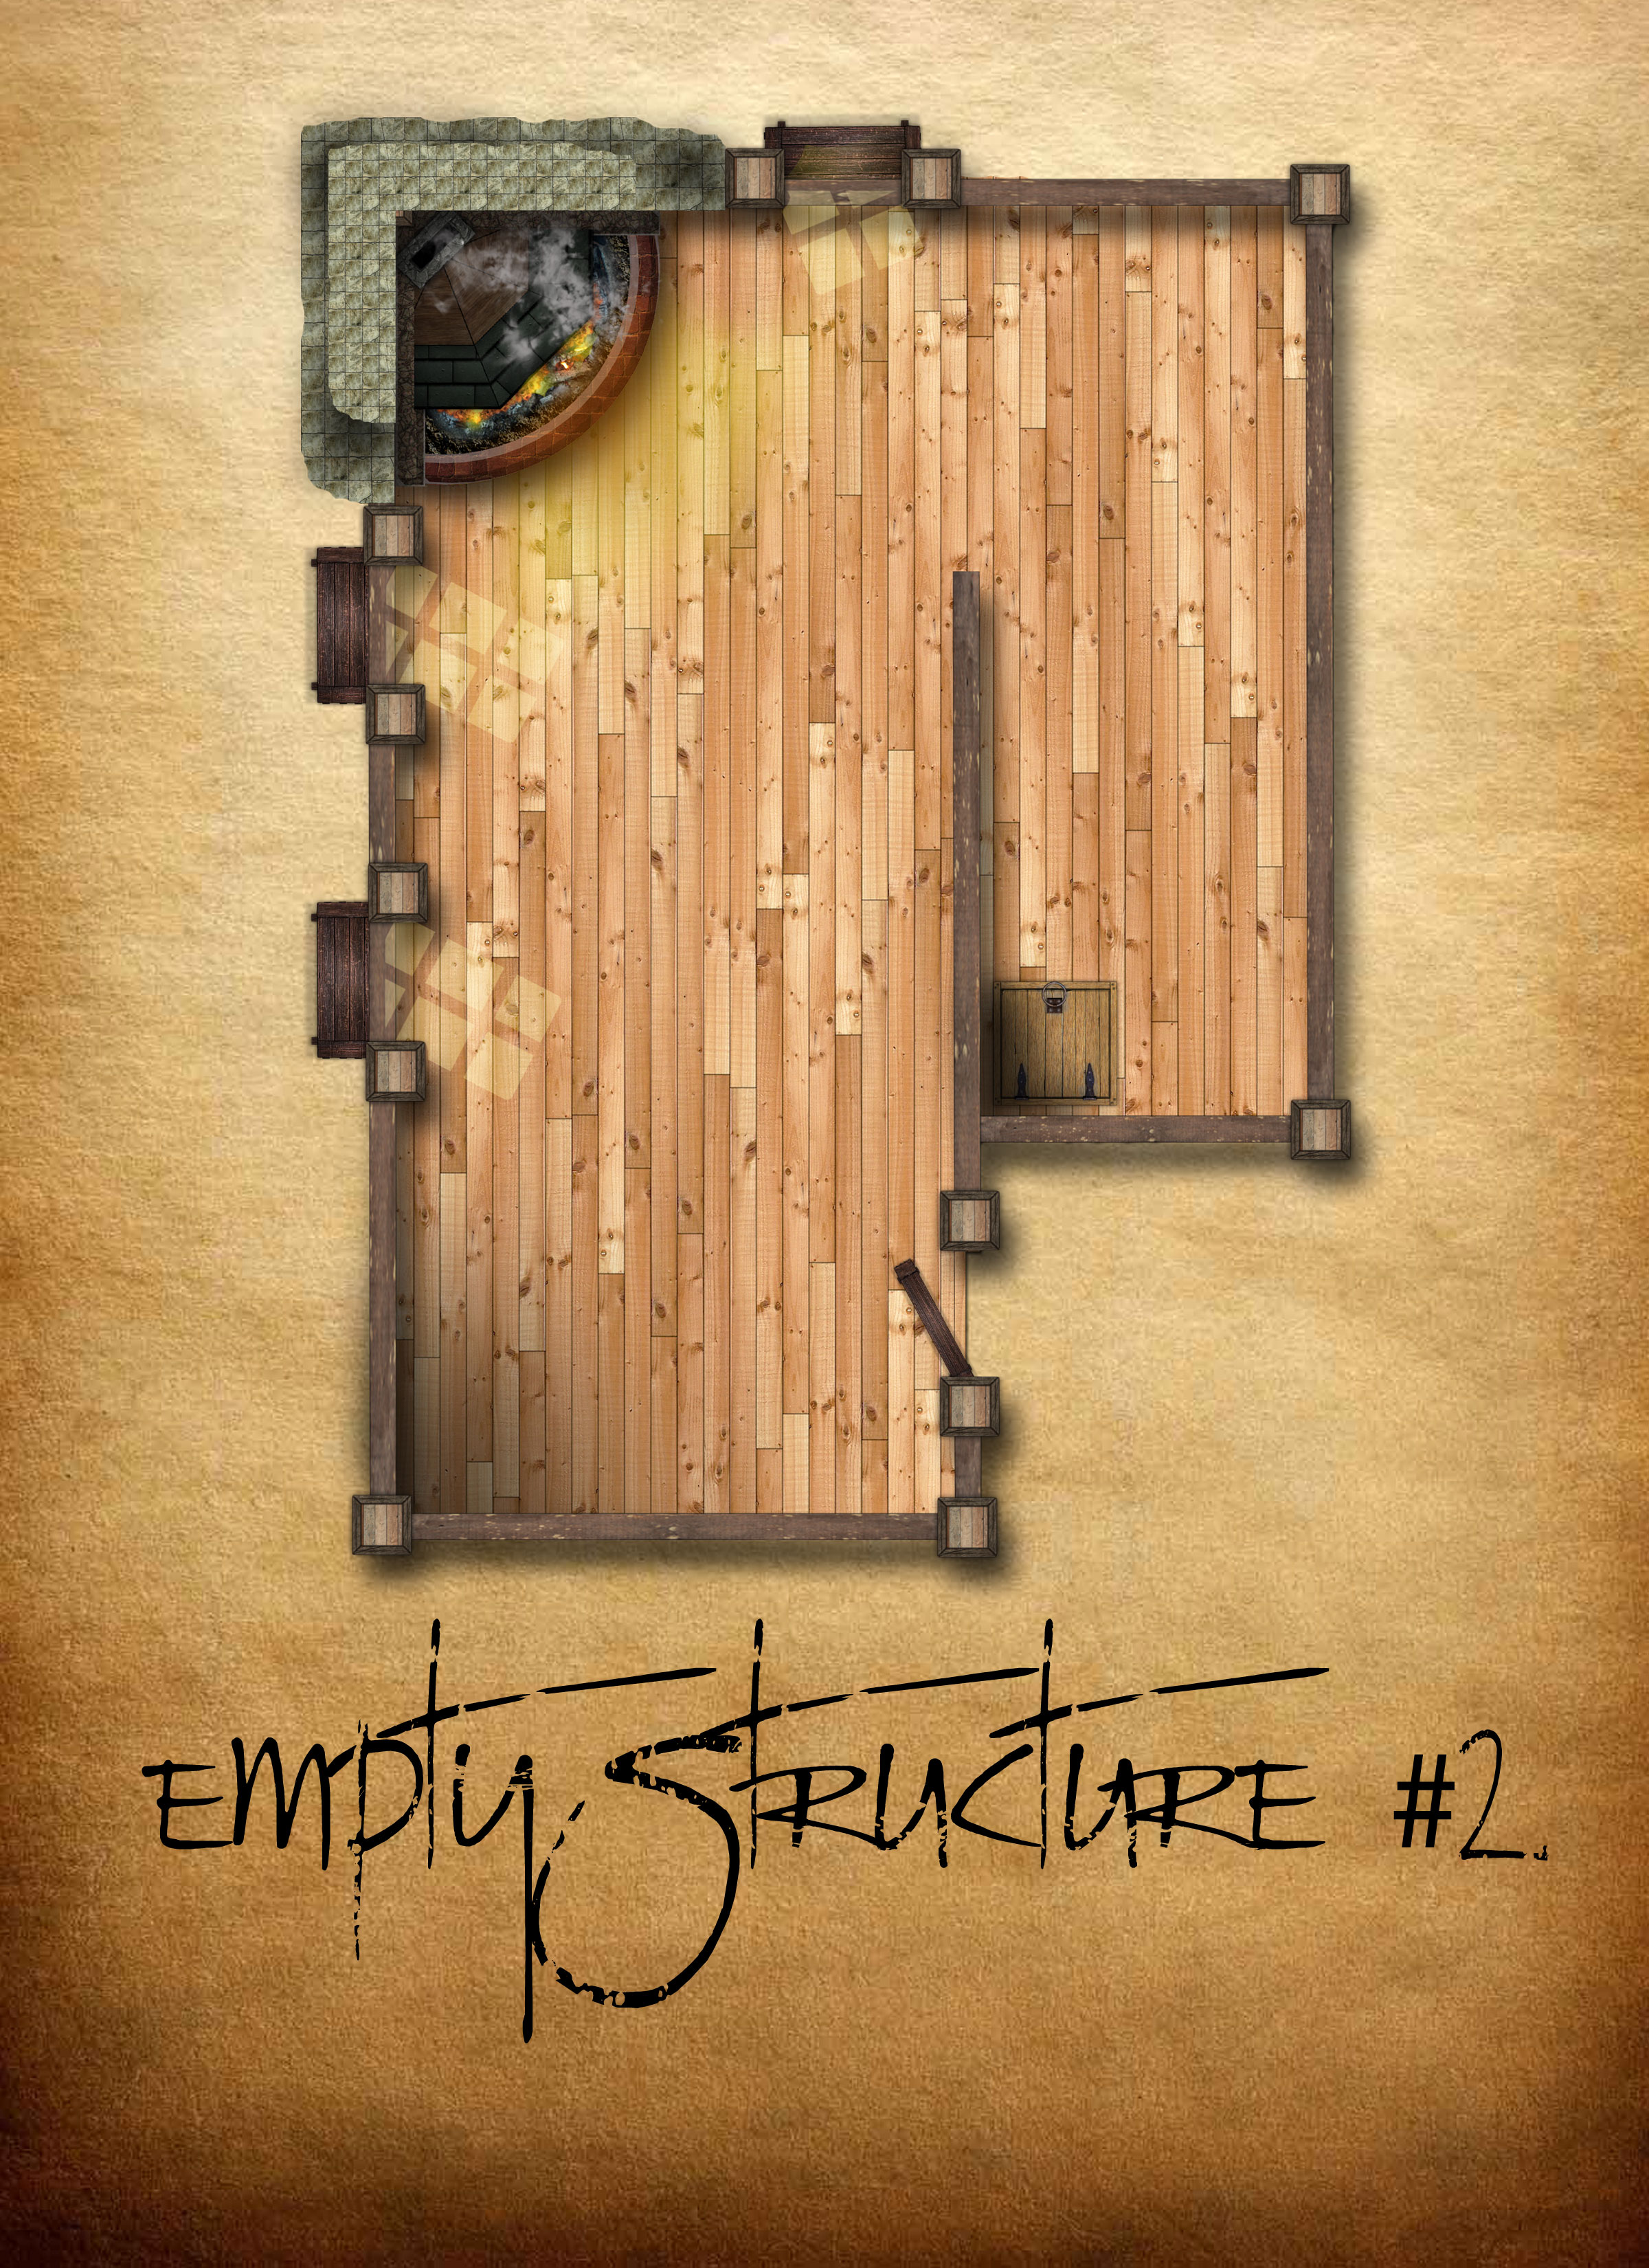 Empty Structure #2 by ladnamedfelix by ladnamedfelix